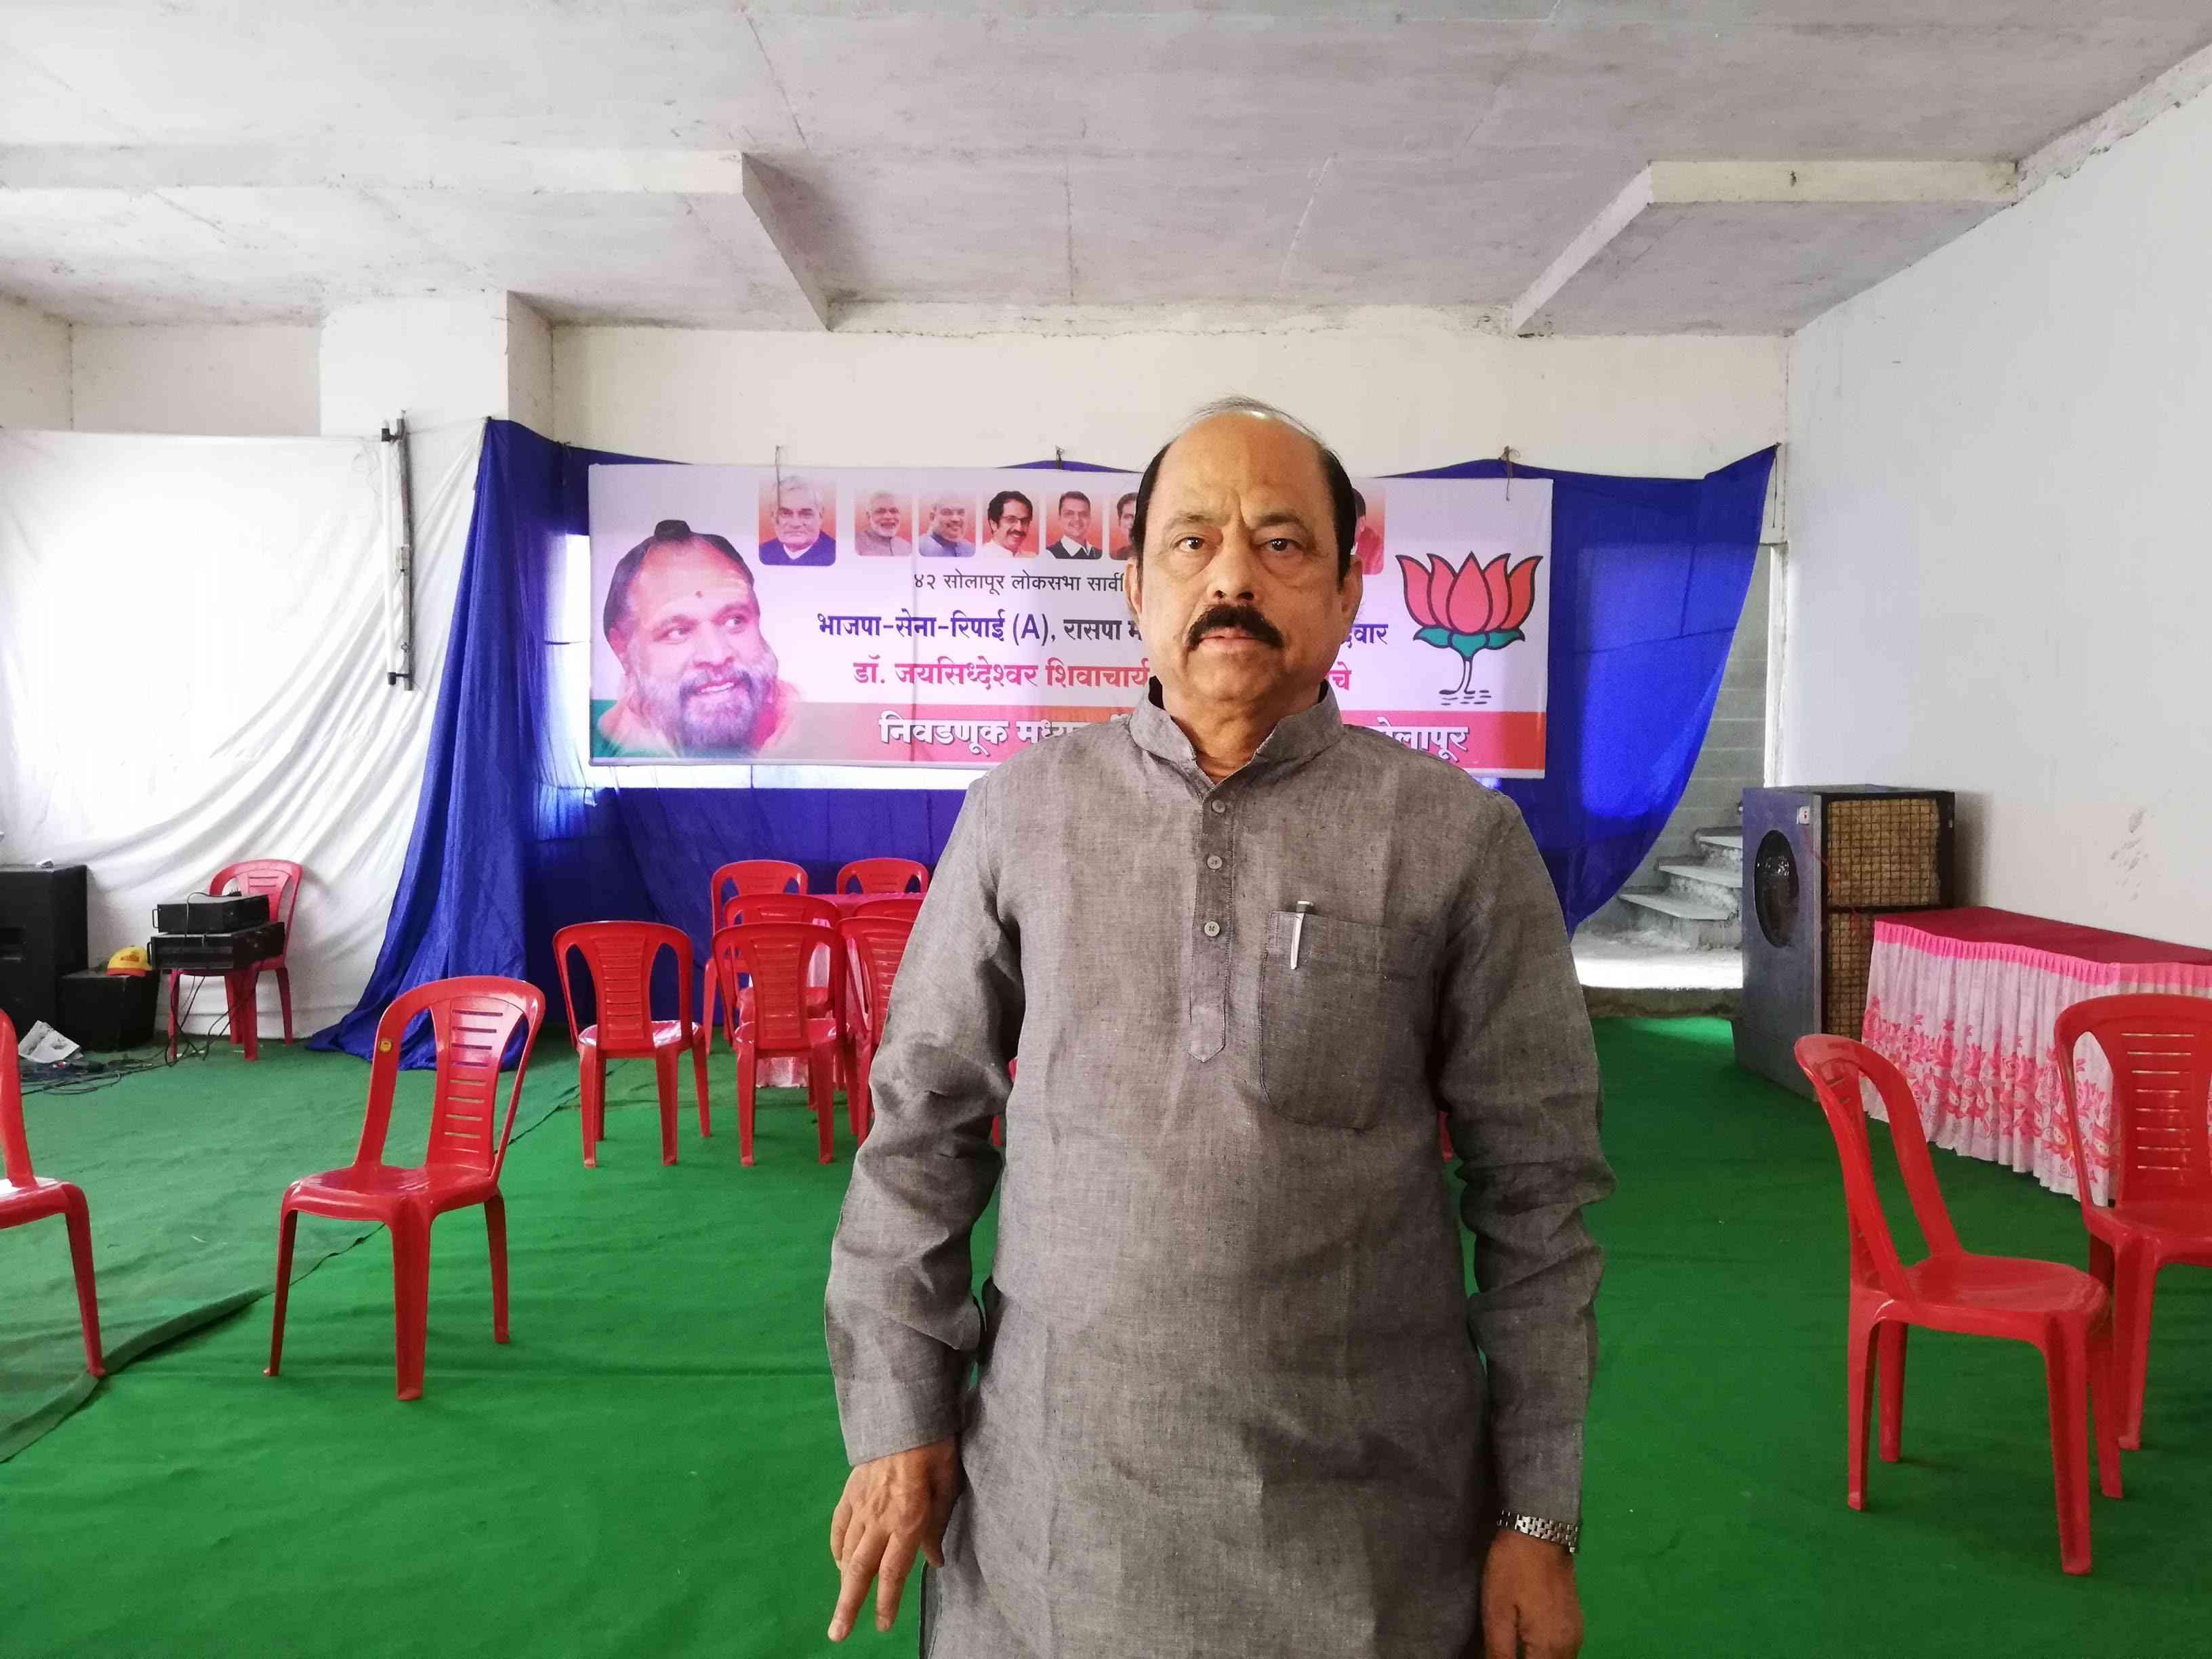 Kishor Deshpande at a BJP office in Solapur. Photo credit: Mridula Chari